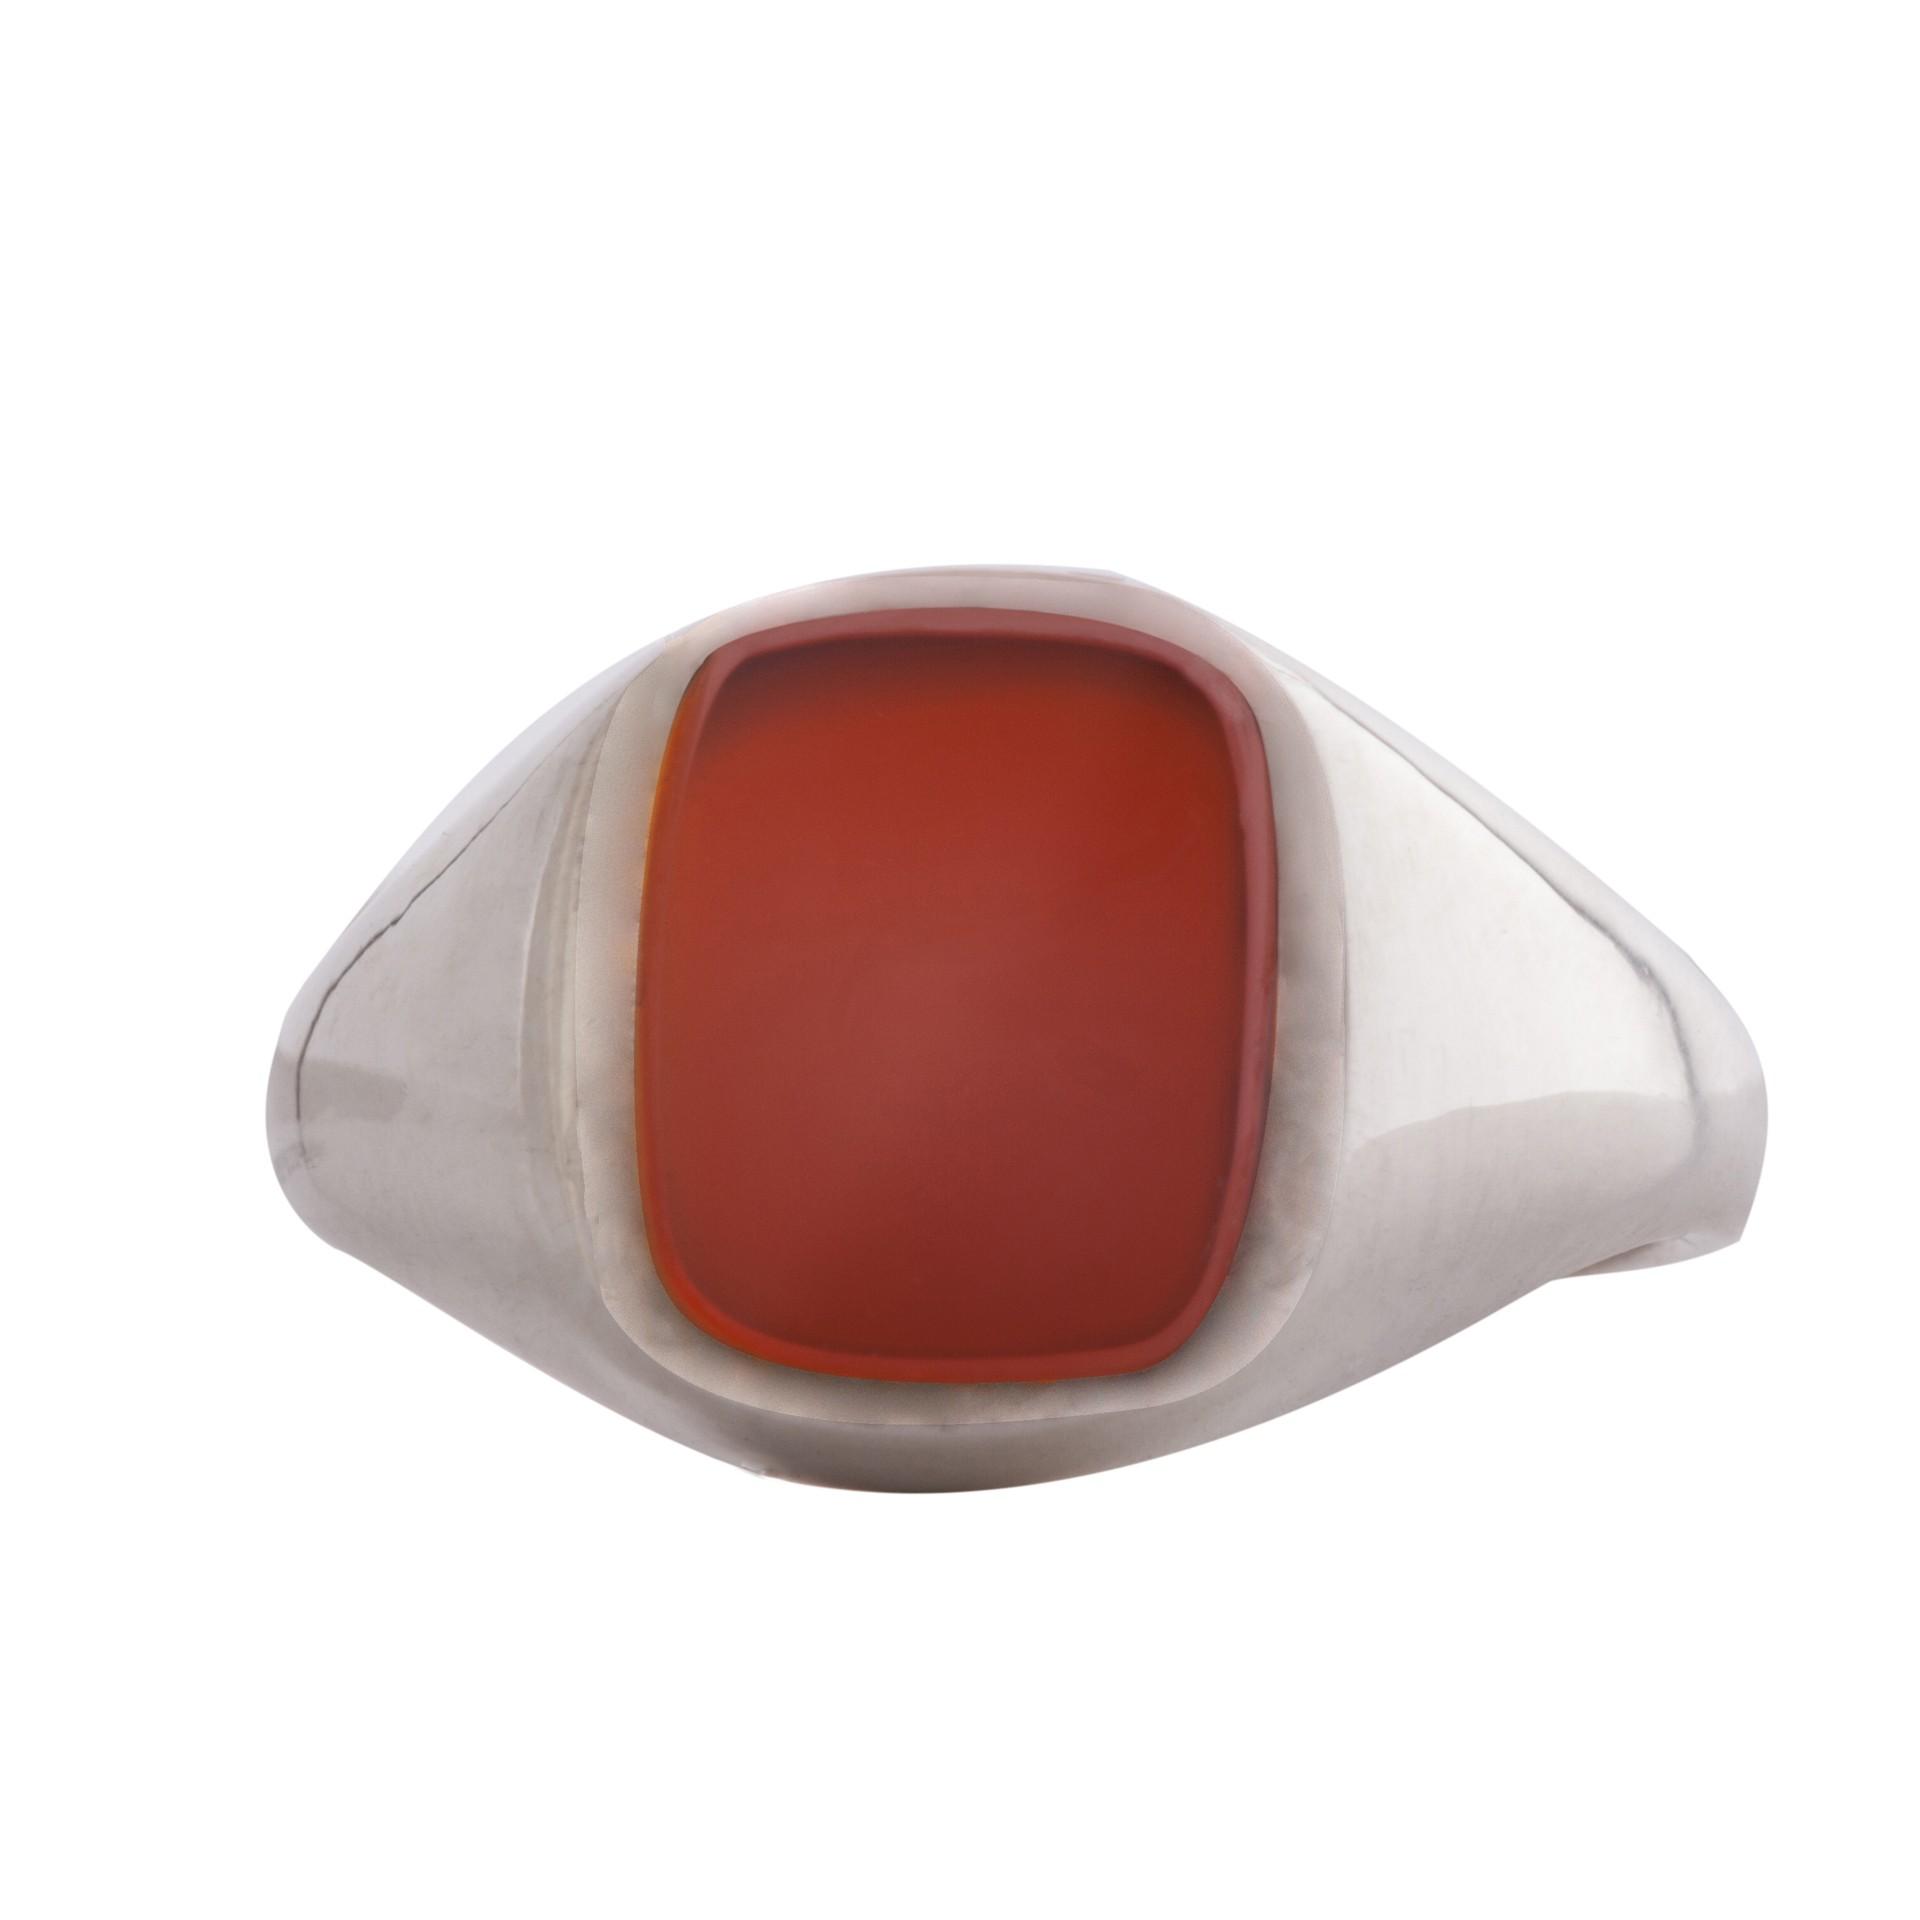 Cornelian stone signet ring